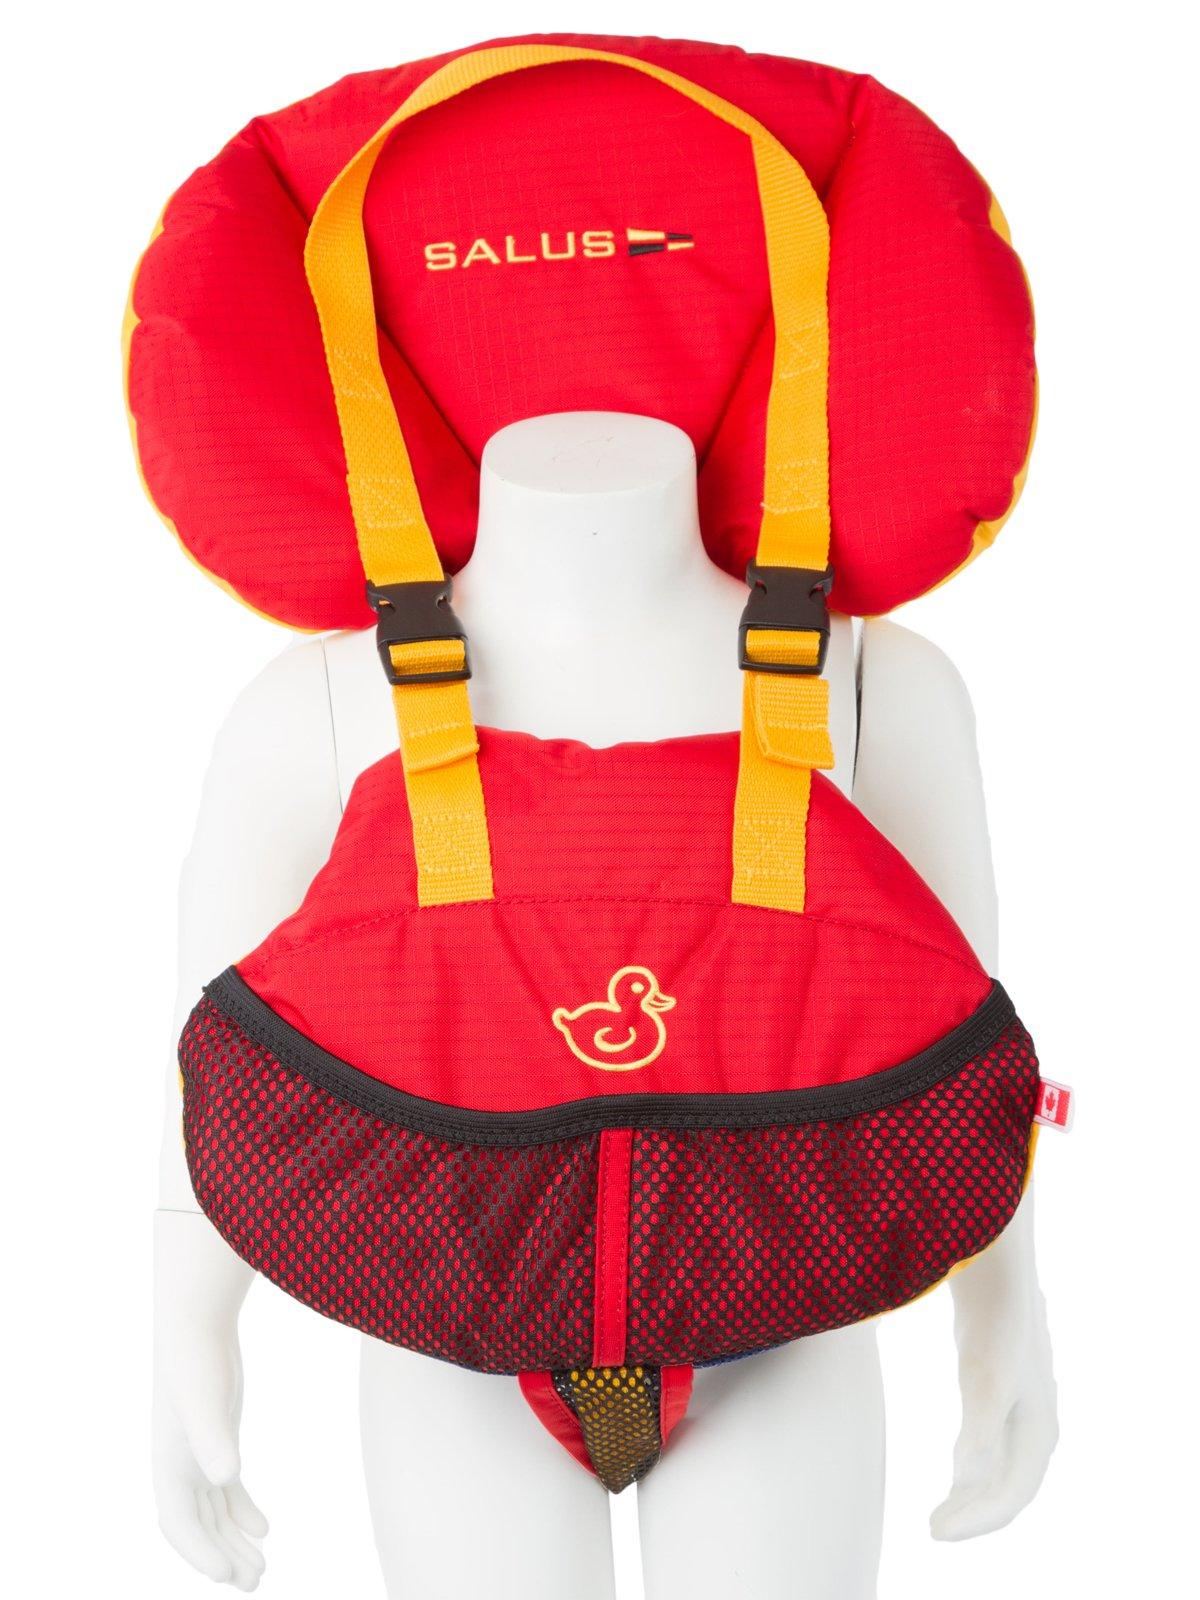 Salus Bijoux Baby Vest - Red by Salus (Image #7)